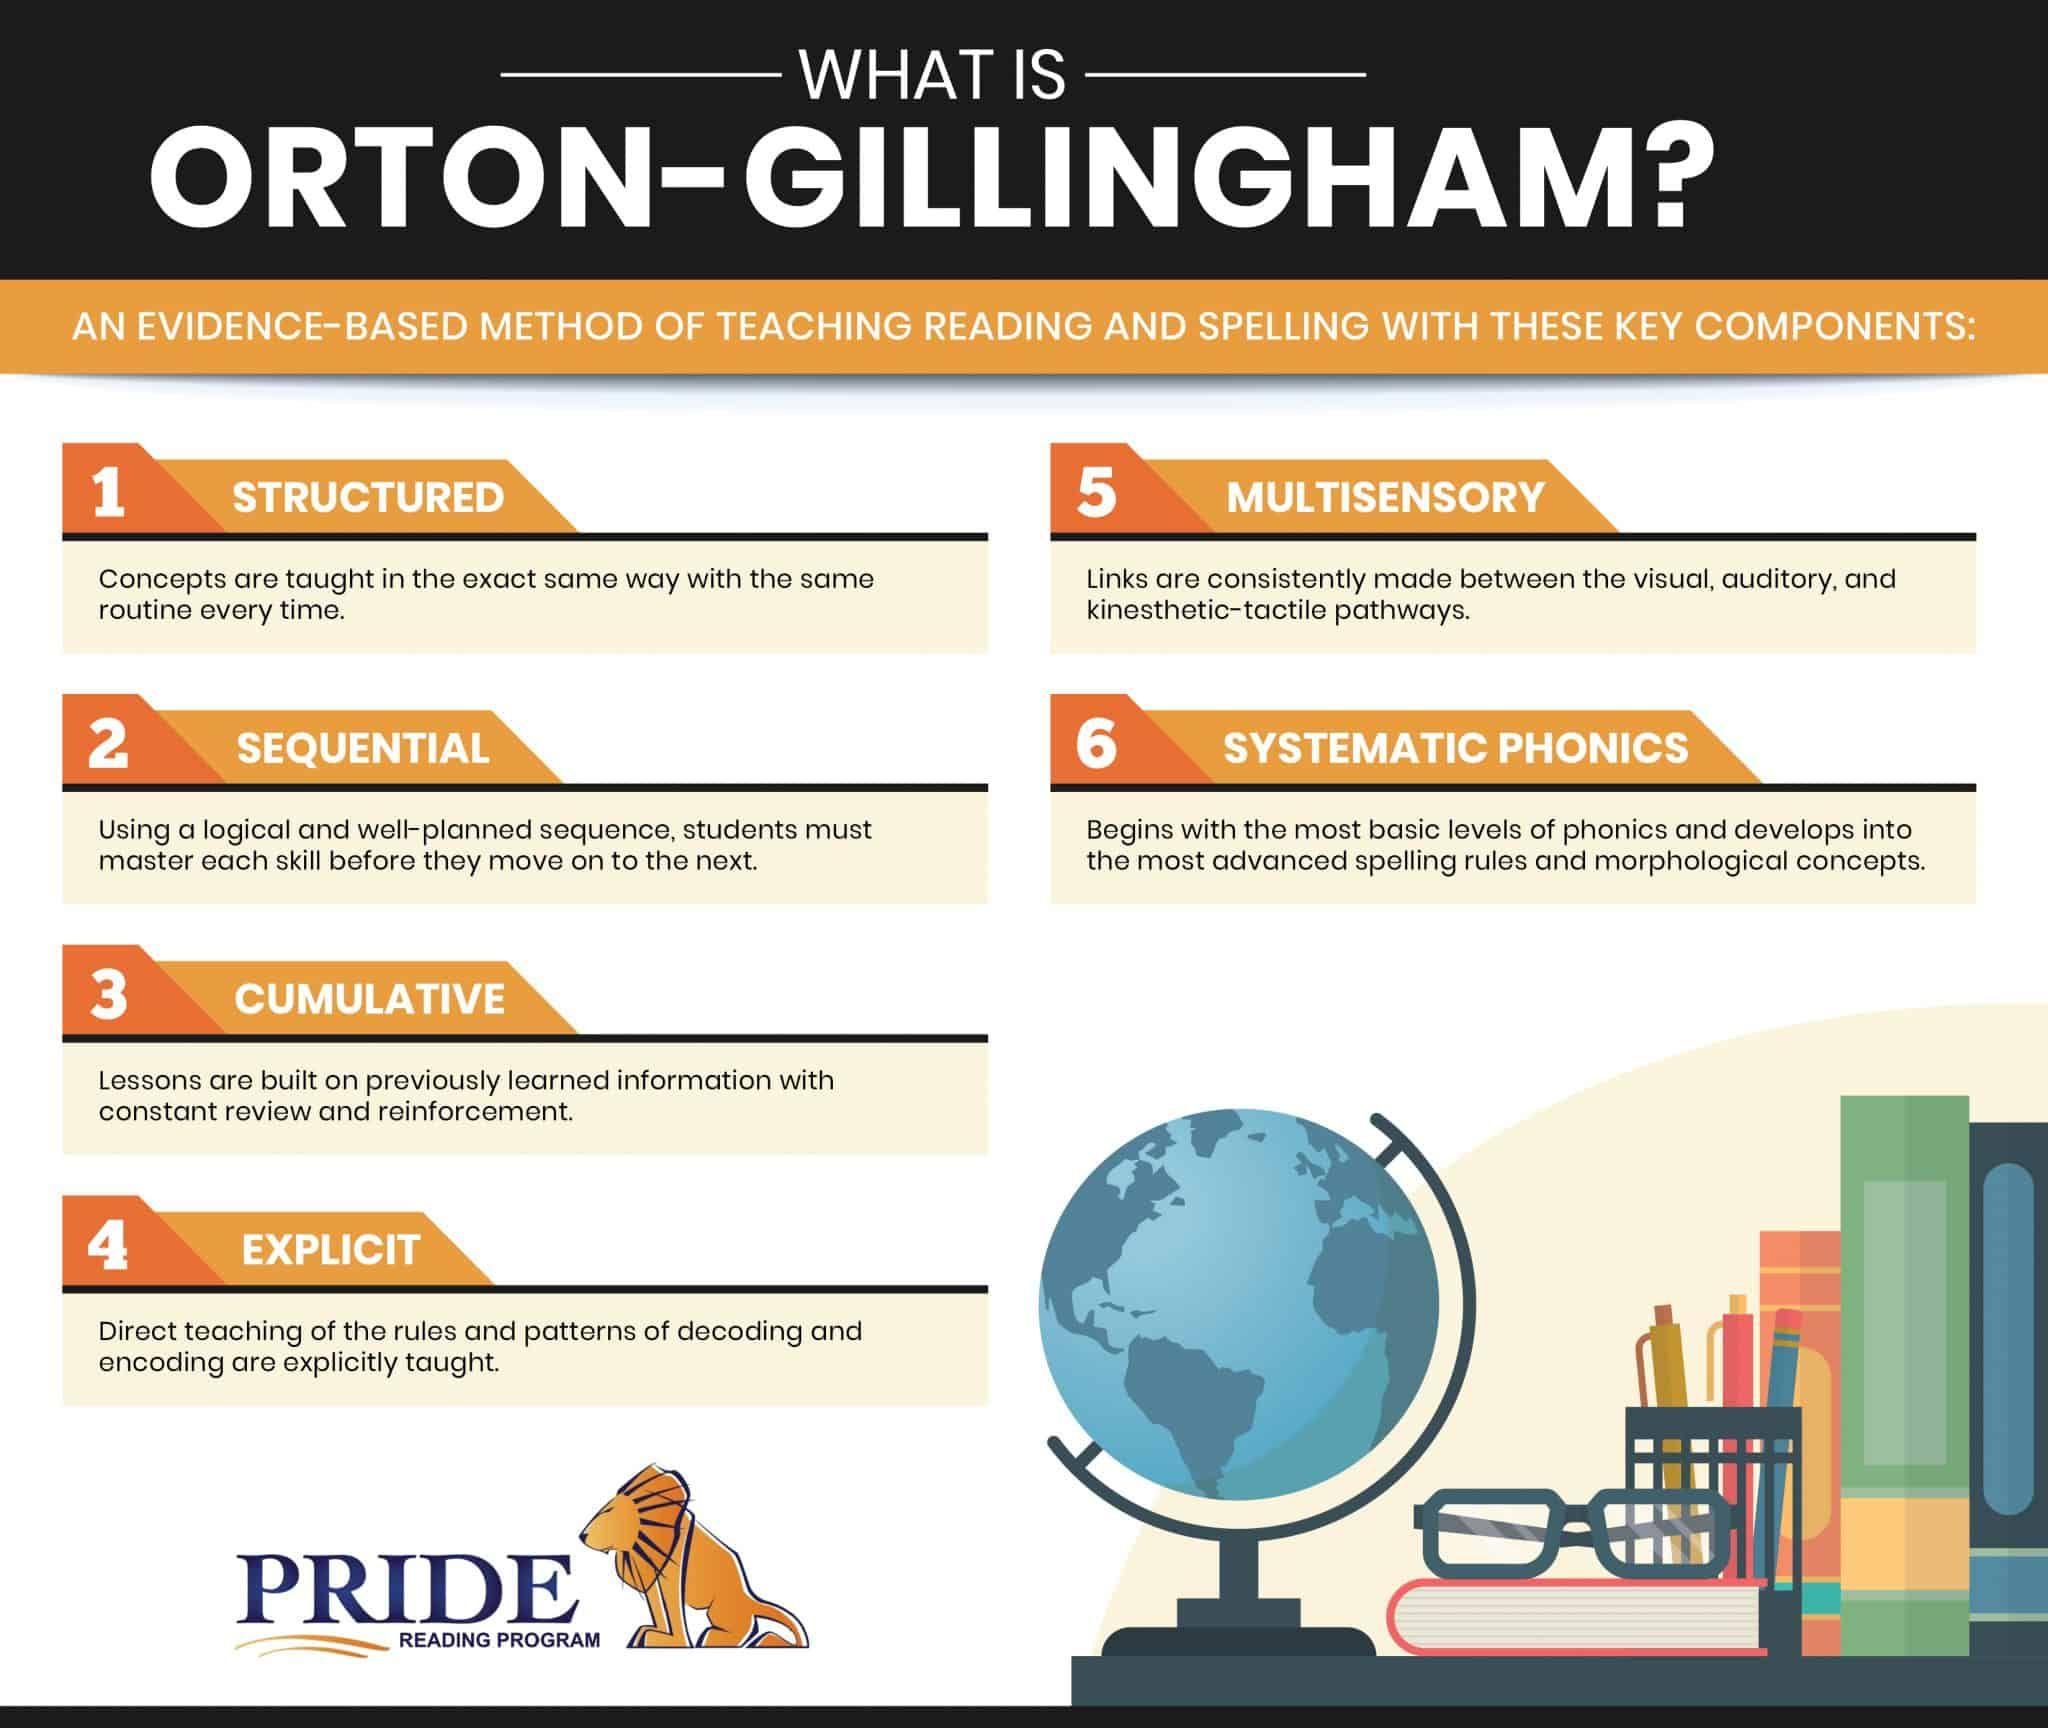 Pride Reading Program Helps Struggling Readers In